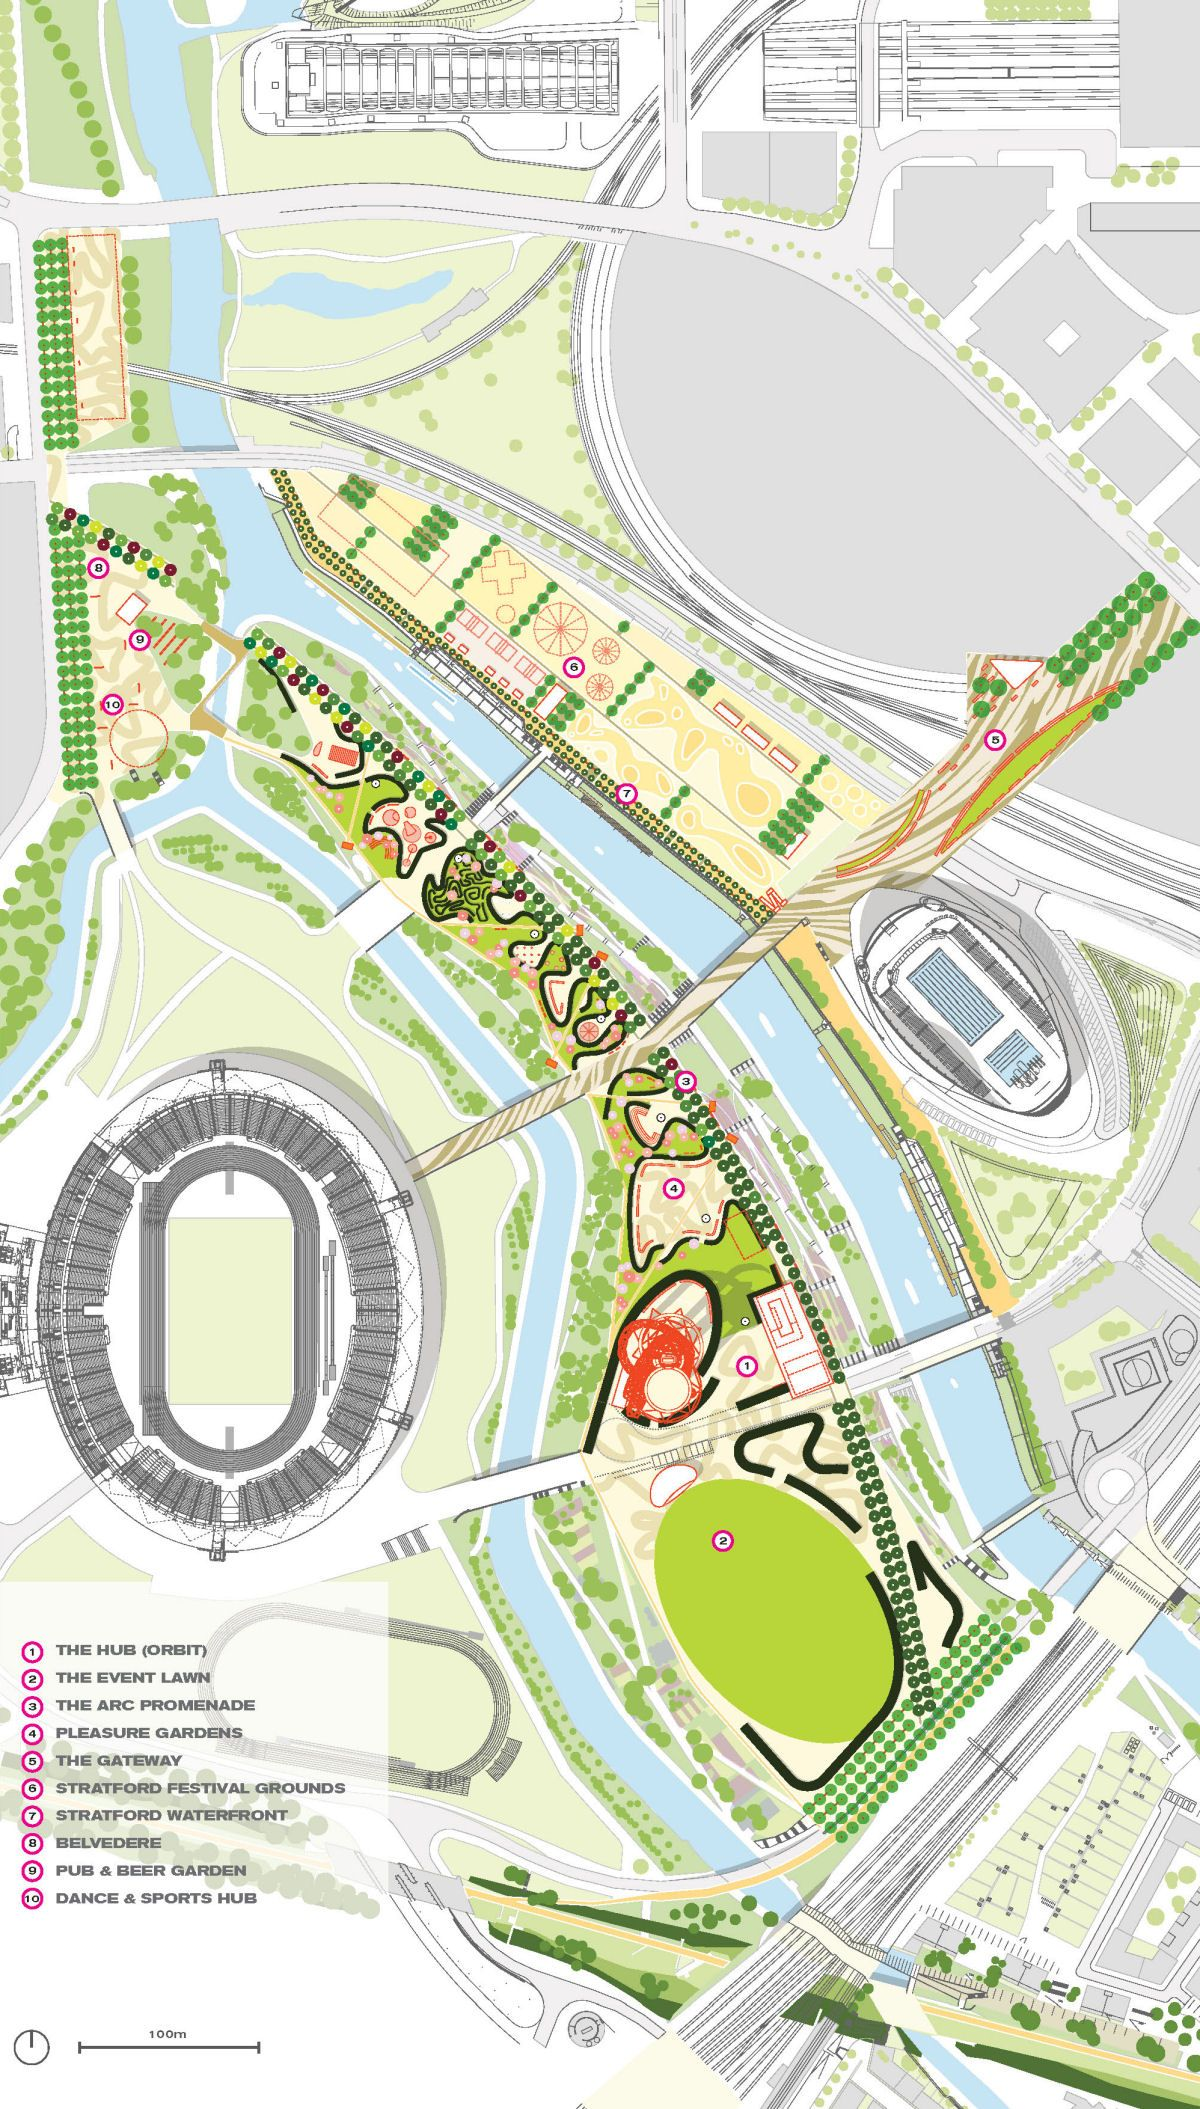 London 2012 transport plan (2nd edition)